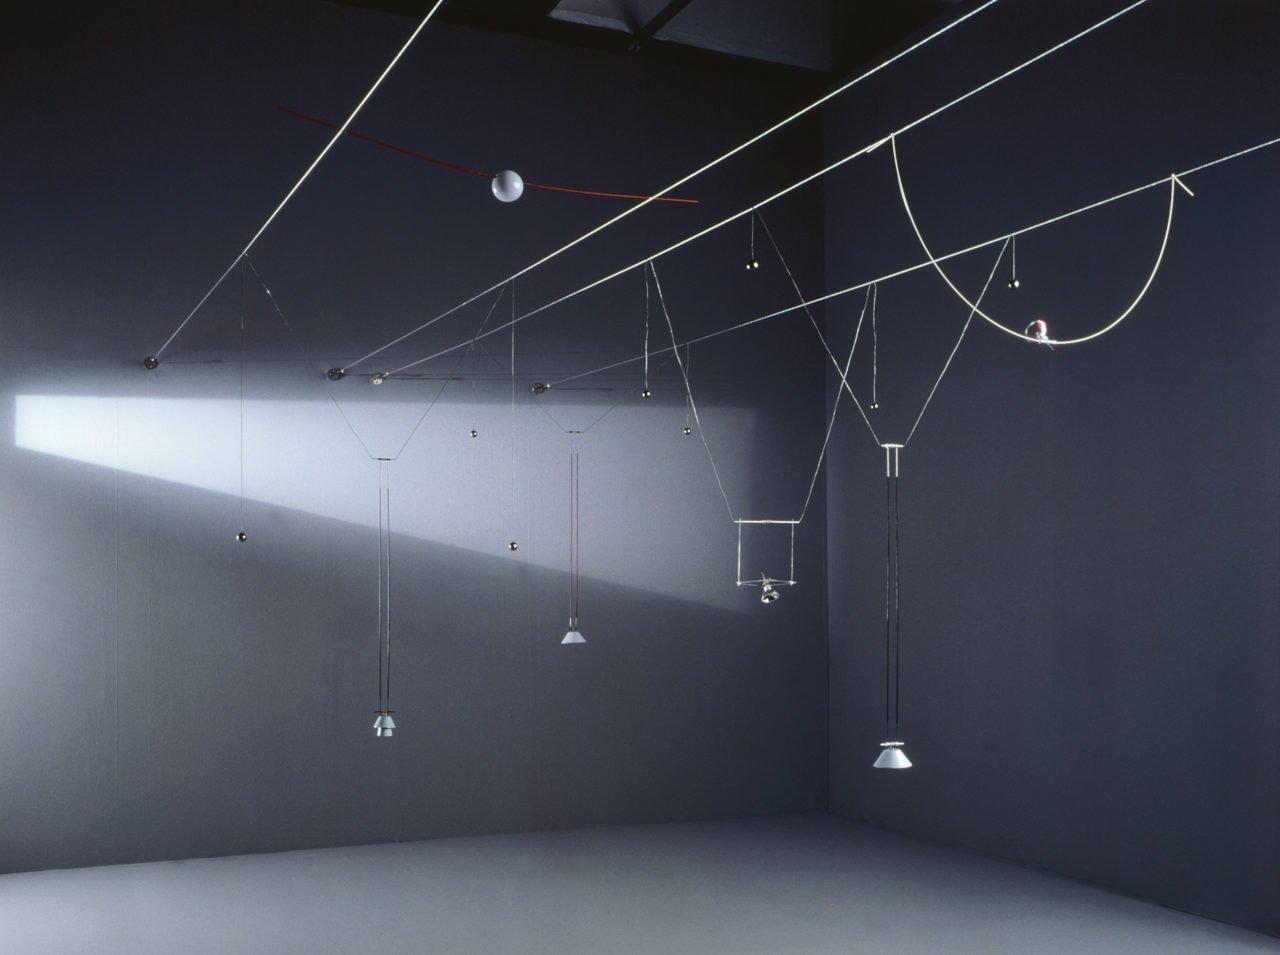 Apartamento Magazine - Thoughts on Ingo Maurer